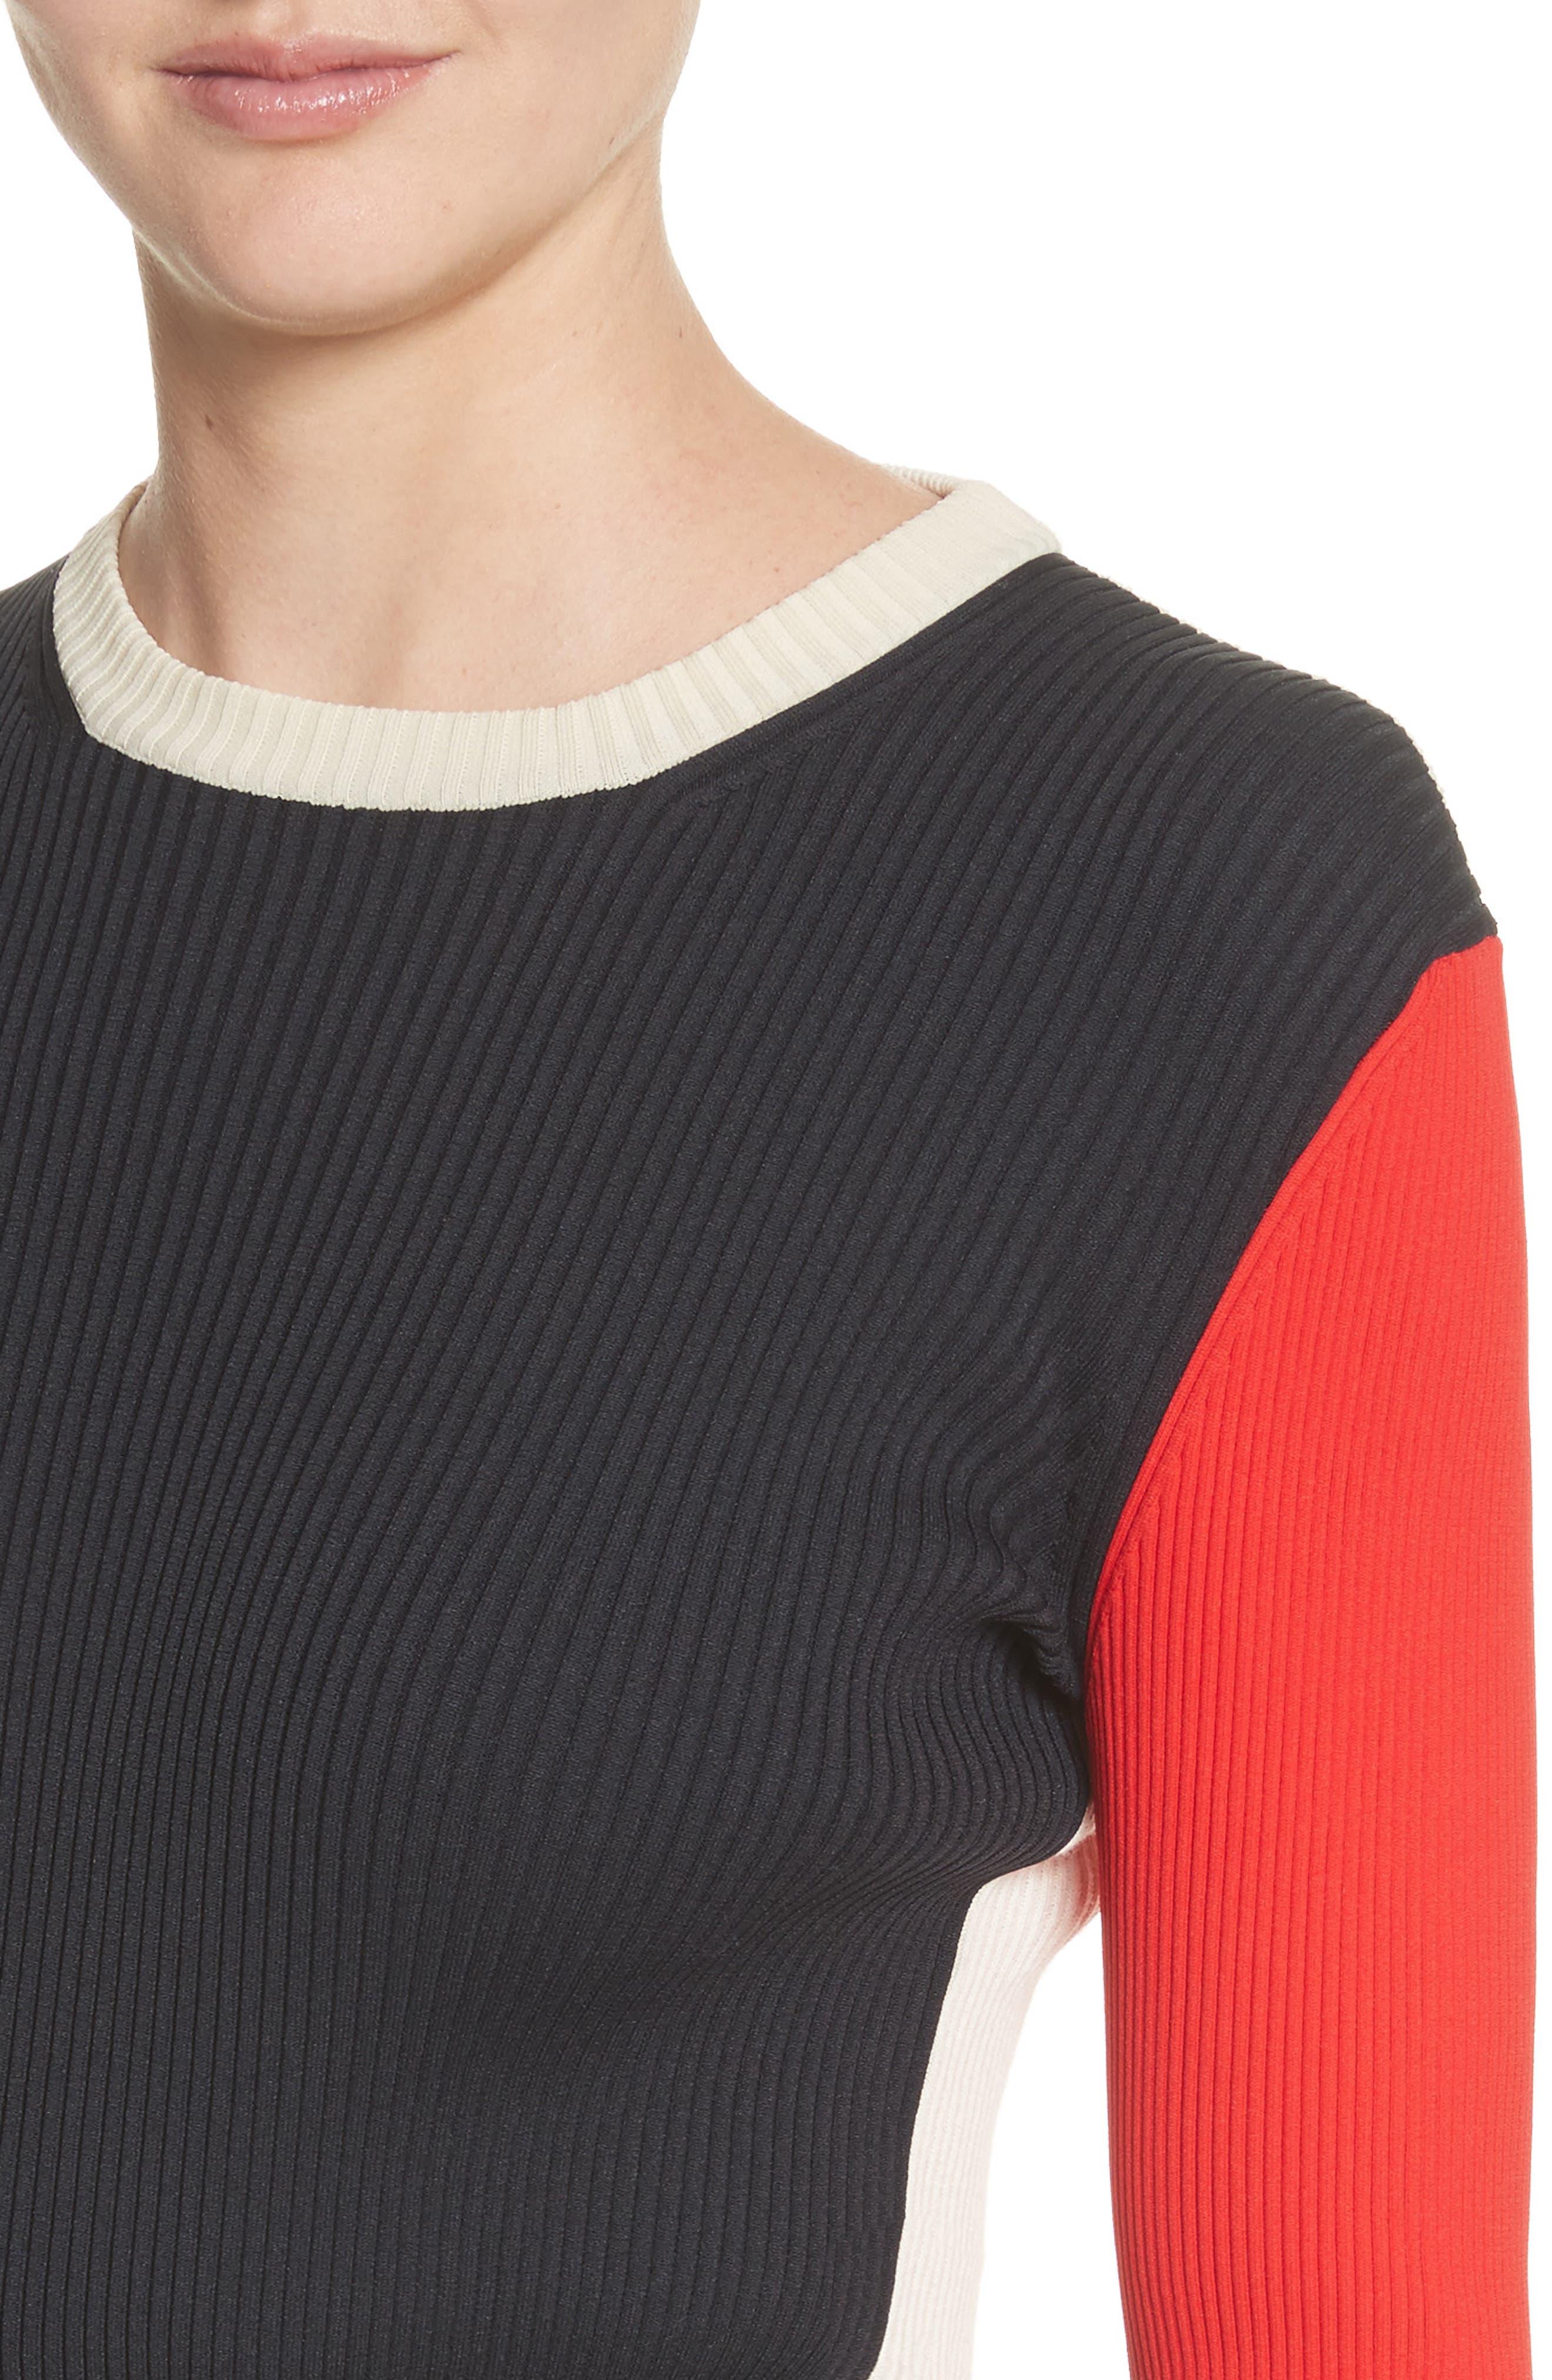 Colorblock Logo Knit Top,                             Alternate thumbnail 6, color,                             Black/ Ecru/ Red